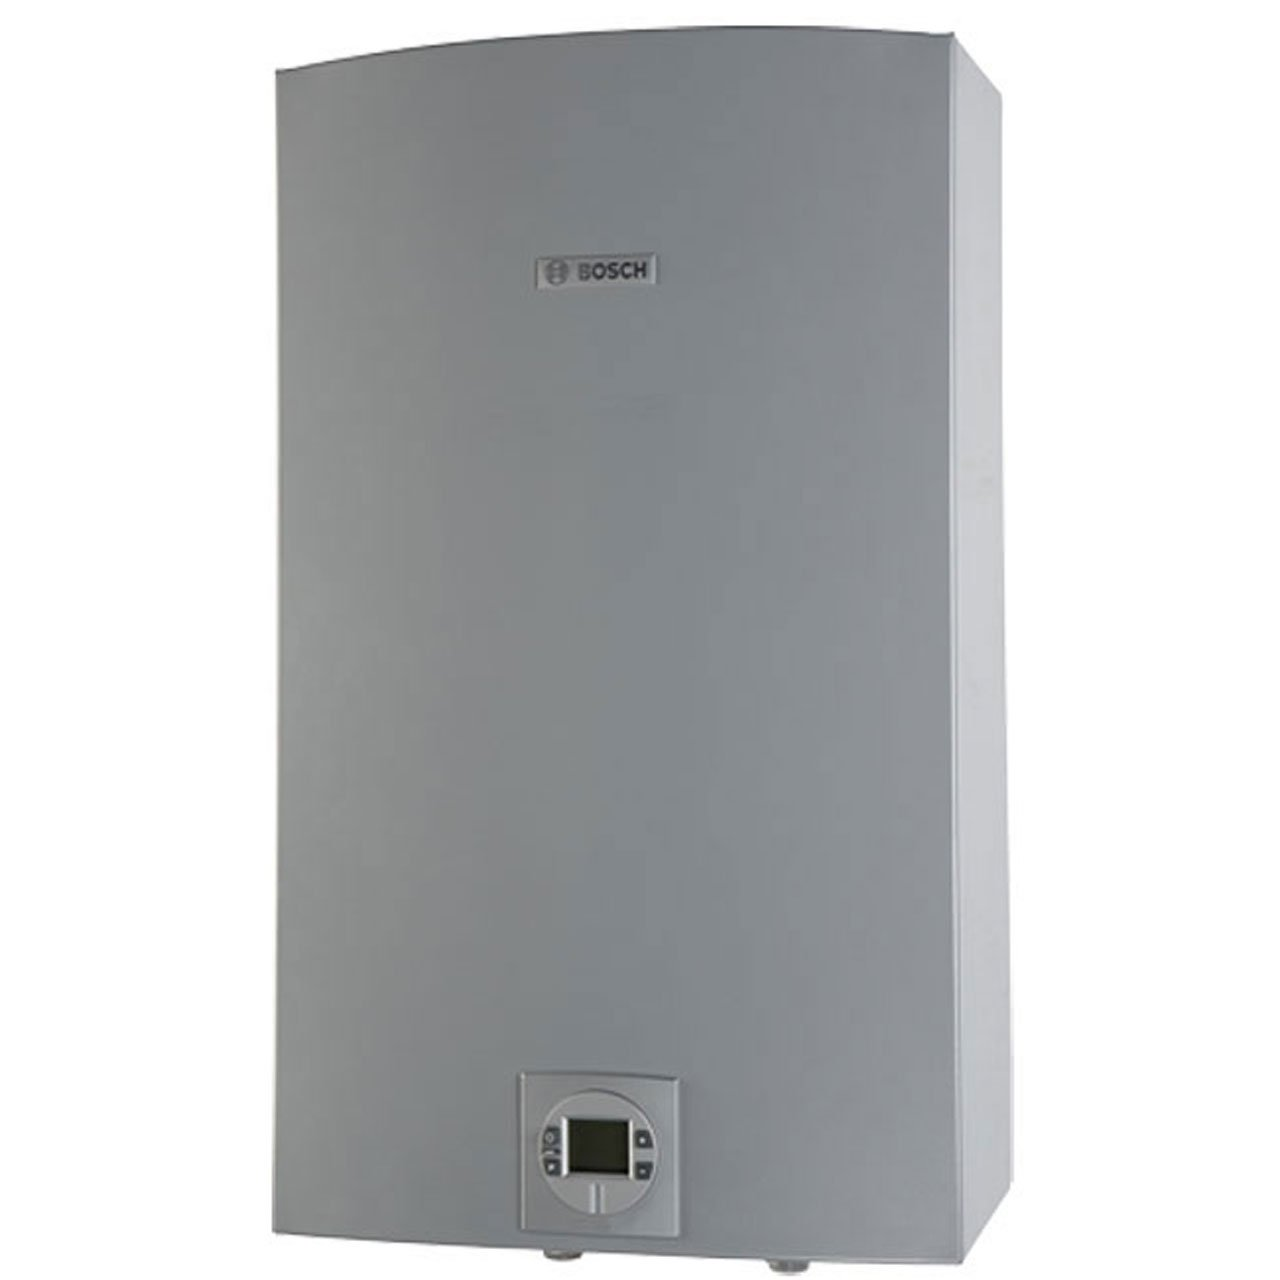 Amazon.com: Bosch 940 es NG calentador calentador de agua ...